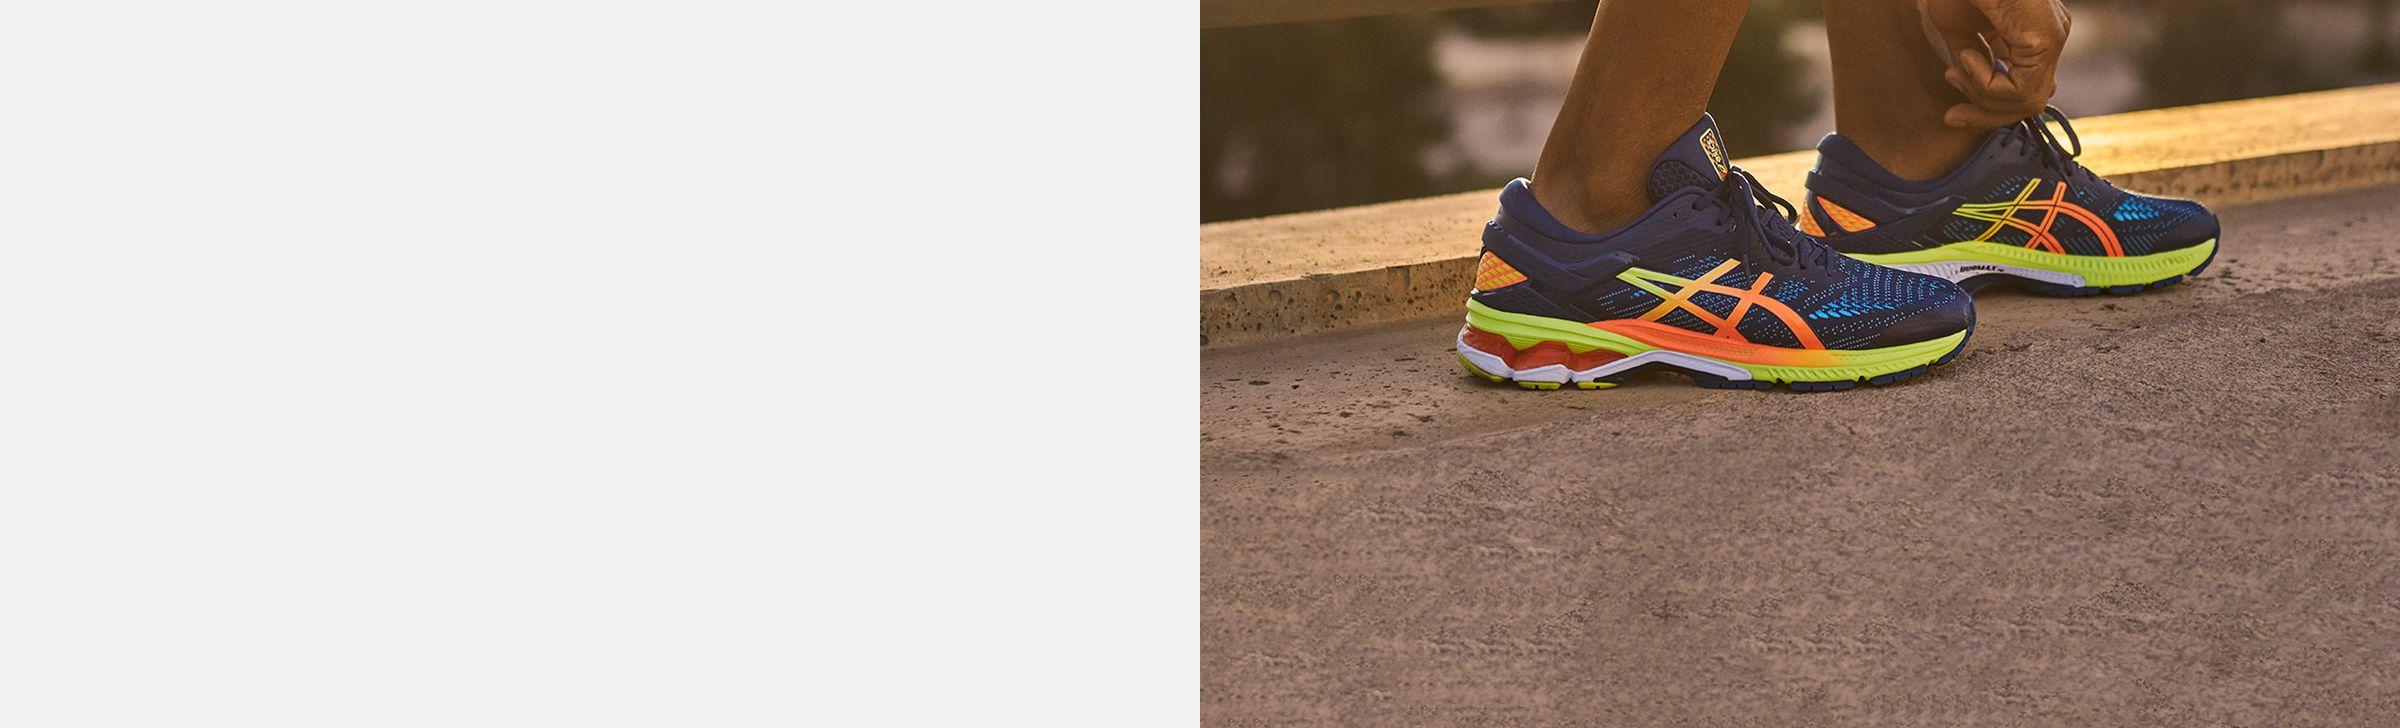 600d9b05b2014 Men's Sports Shoes   Nike, Adidas, Asics, Saucony   John Lewis